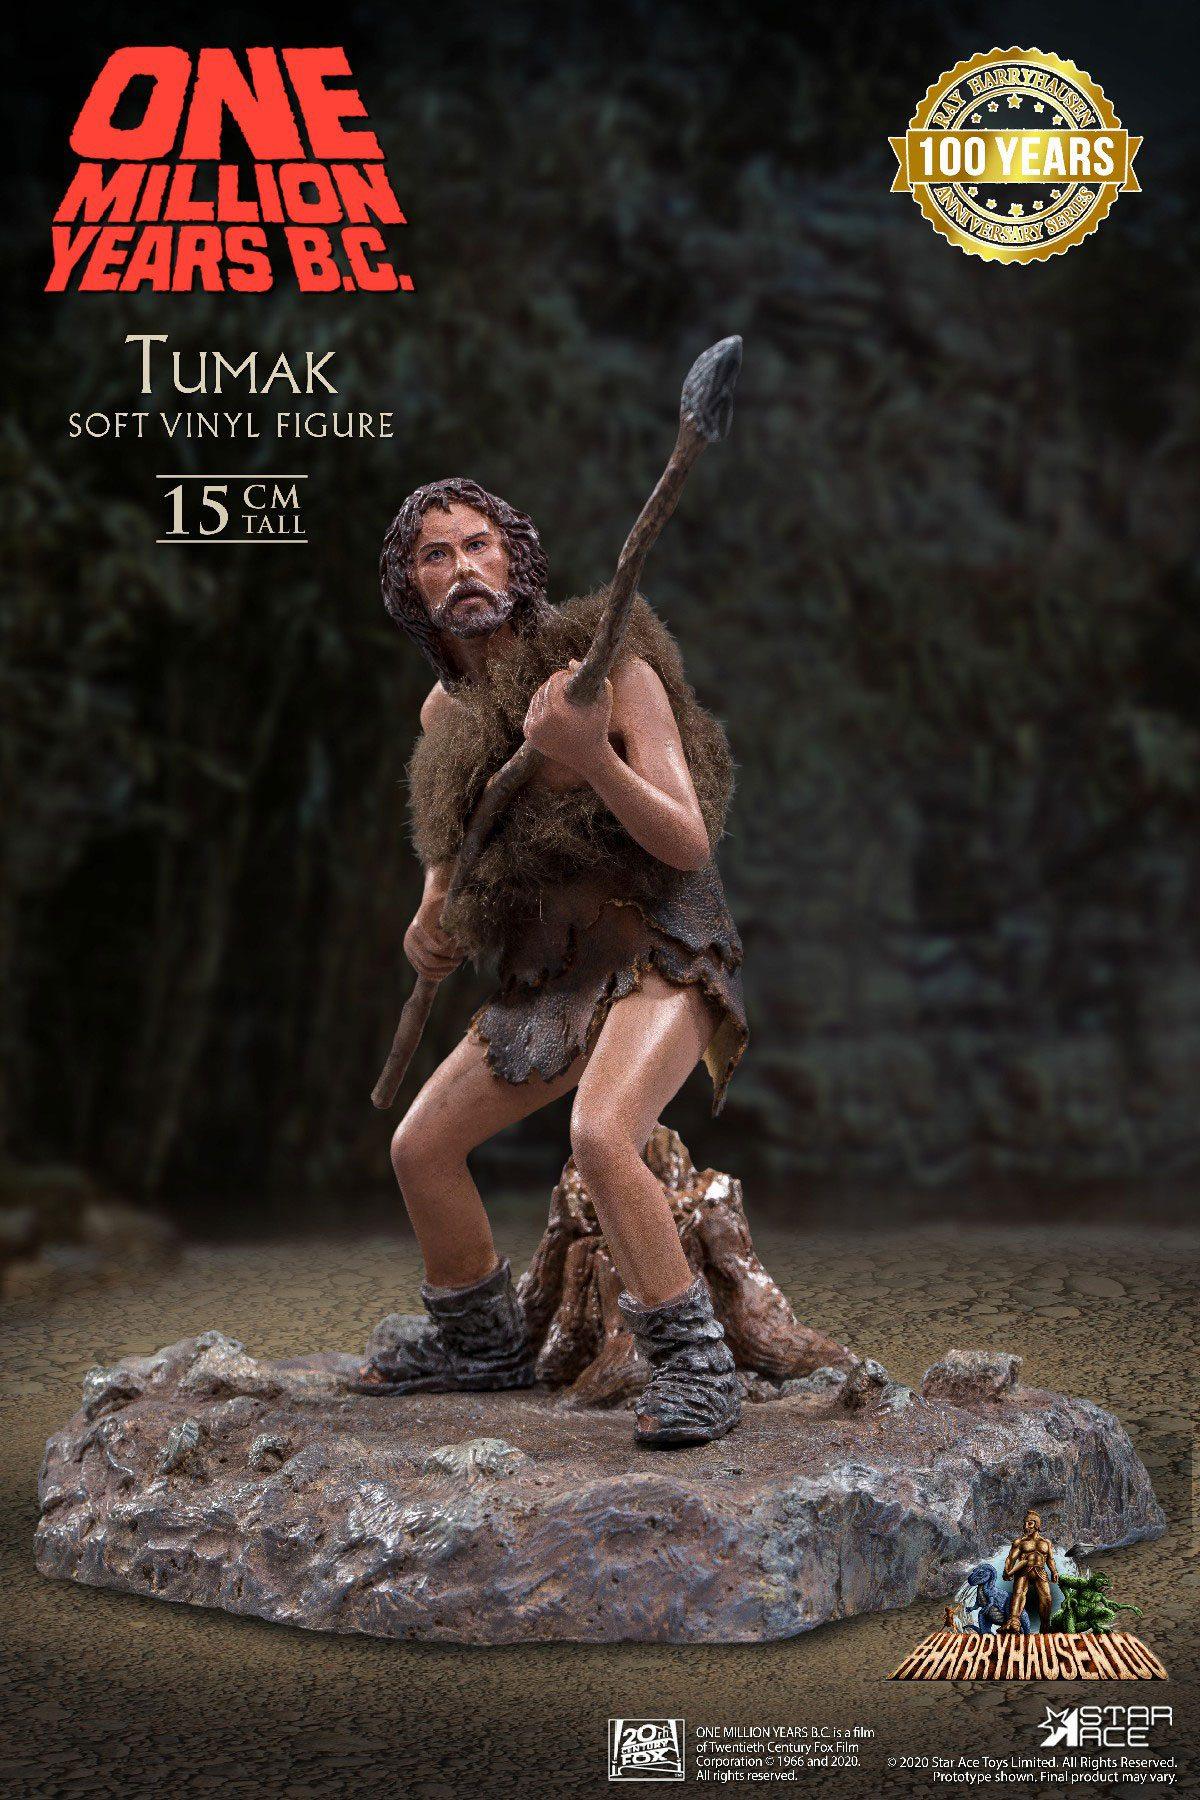 One Million Years B.C. Soft Vinyl Statue Tumak 15 cm